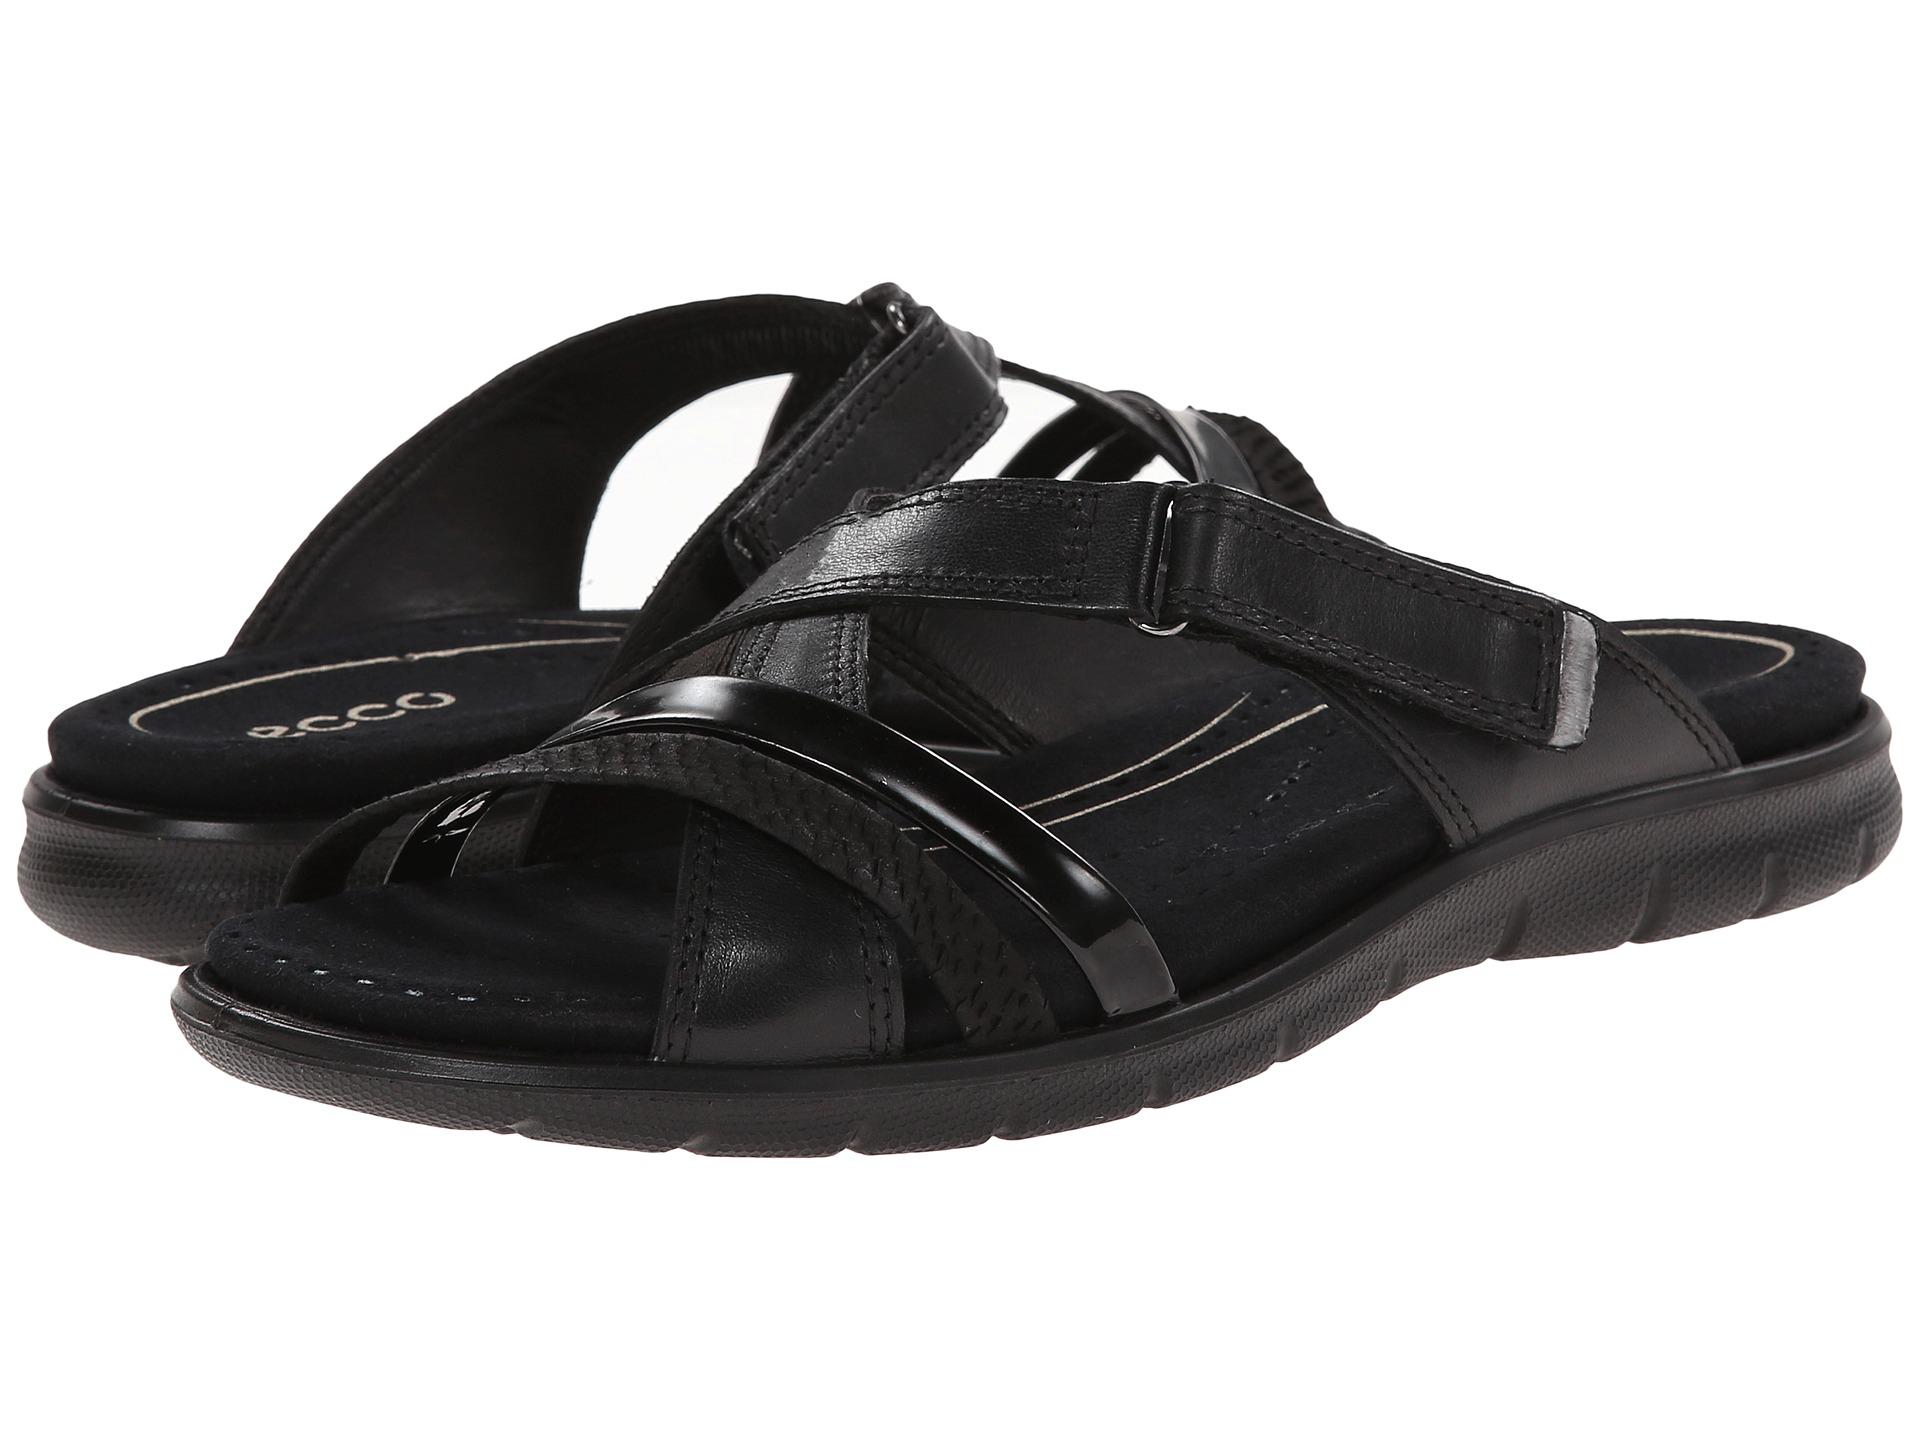 044544fa81f4 Lyst - Ecco Babett Sandal Strap Slide in Black